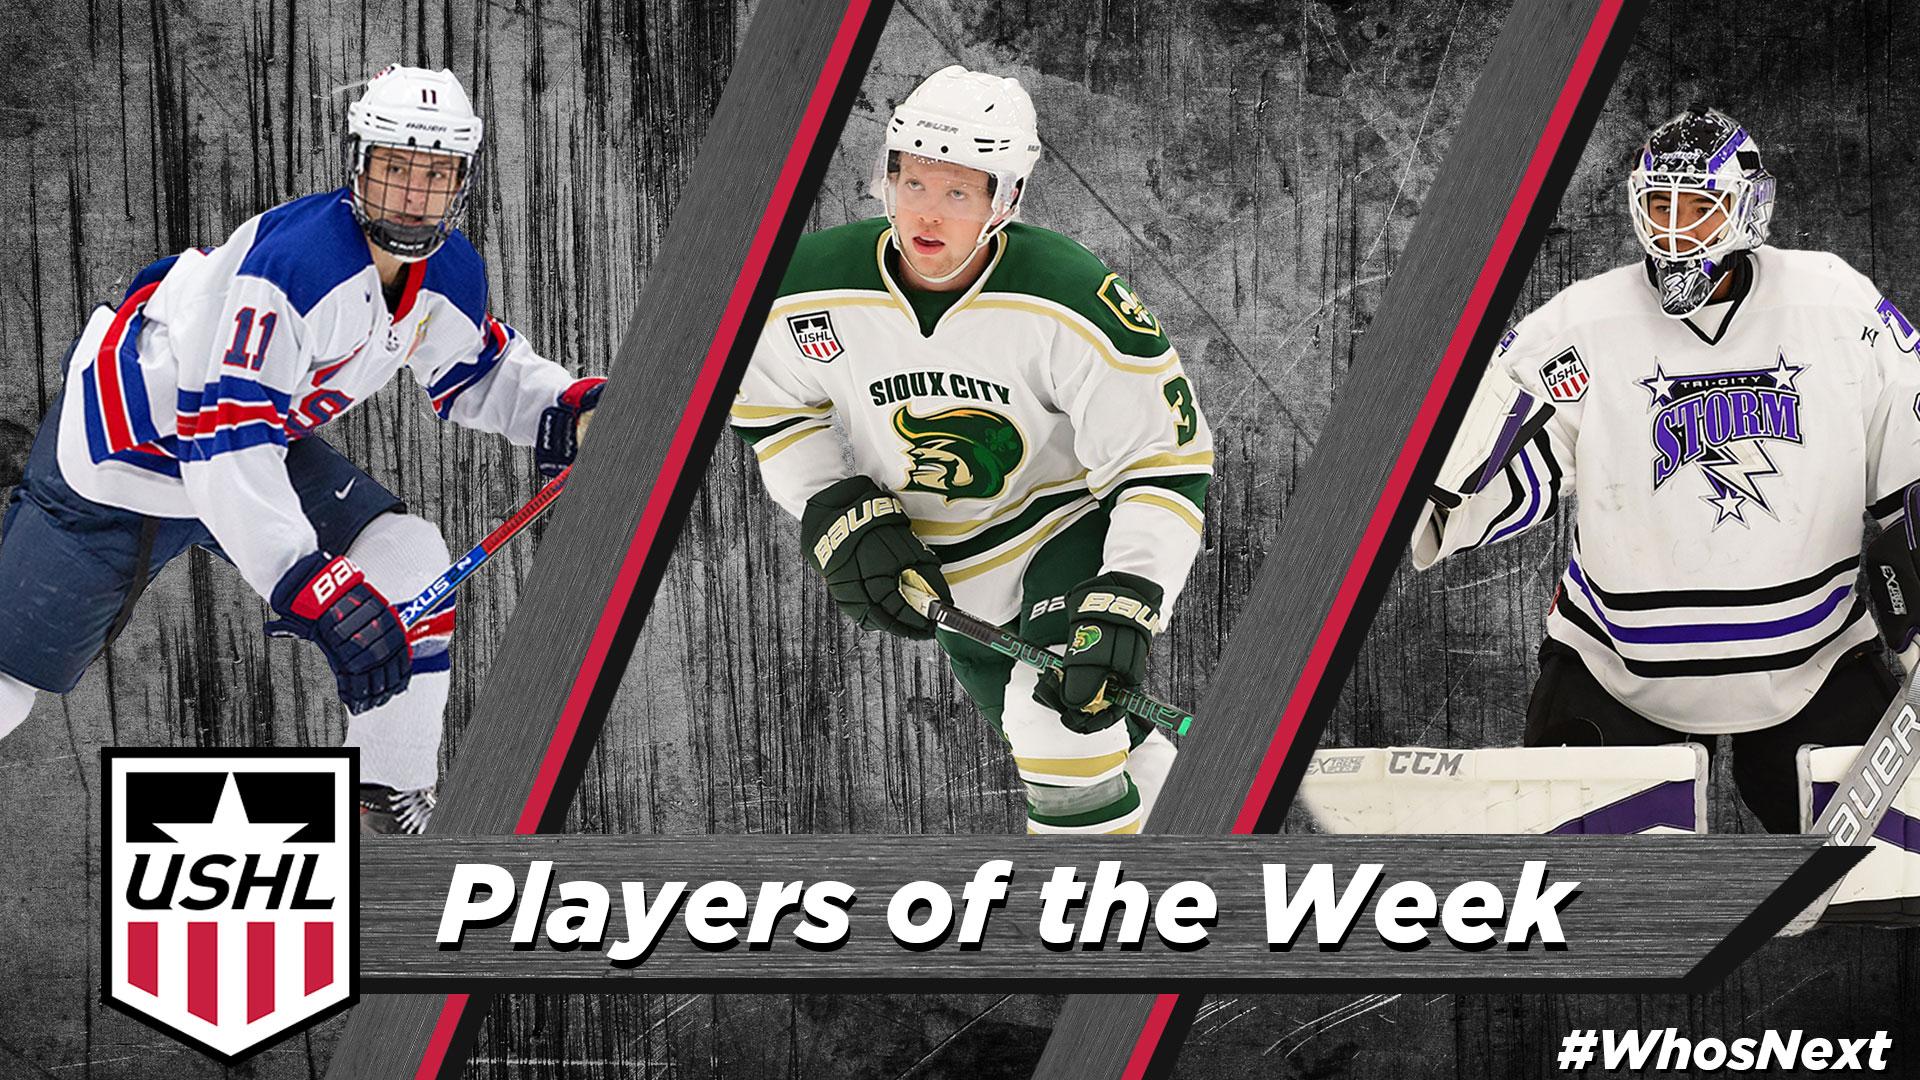 USHL: USHL Players Of The Week - Week 5, 2018-19